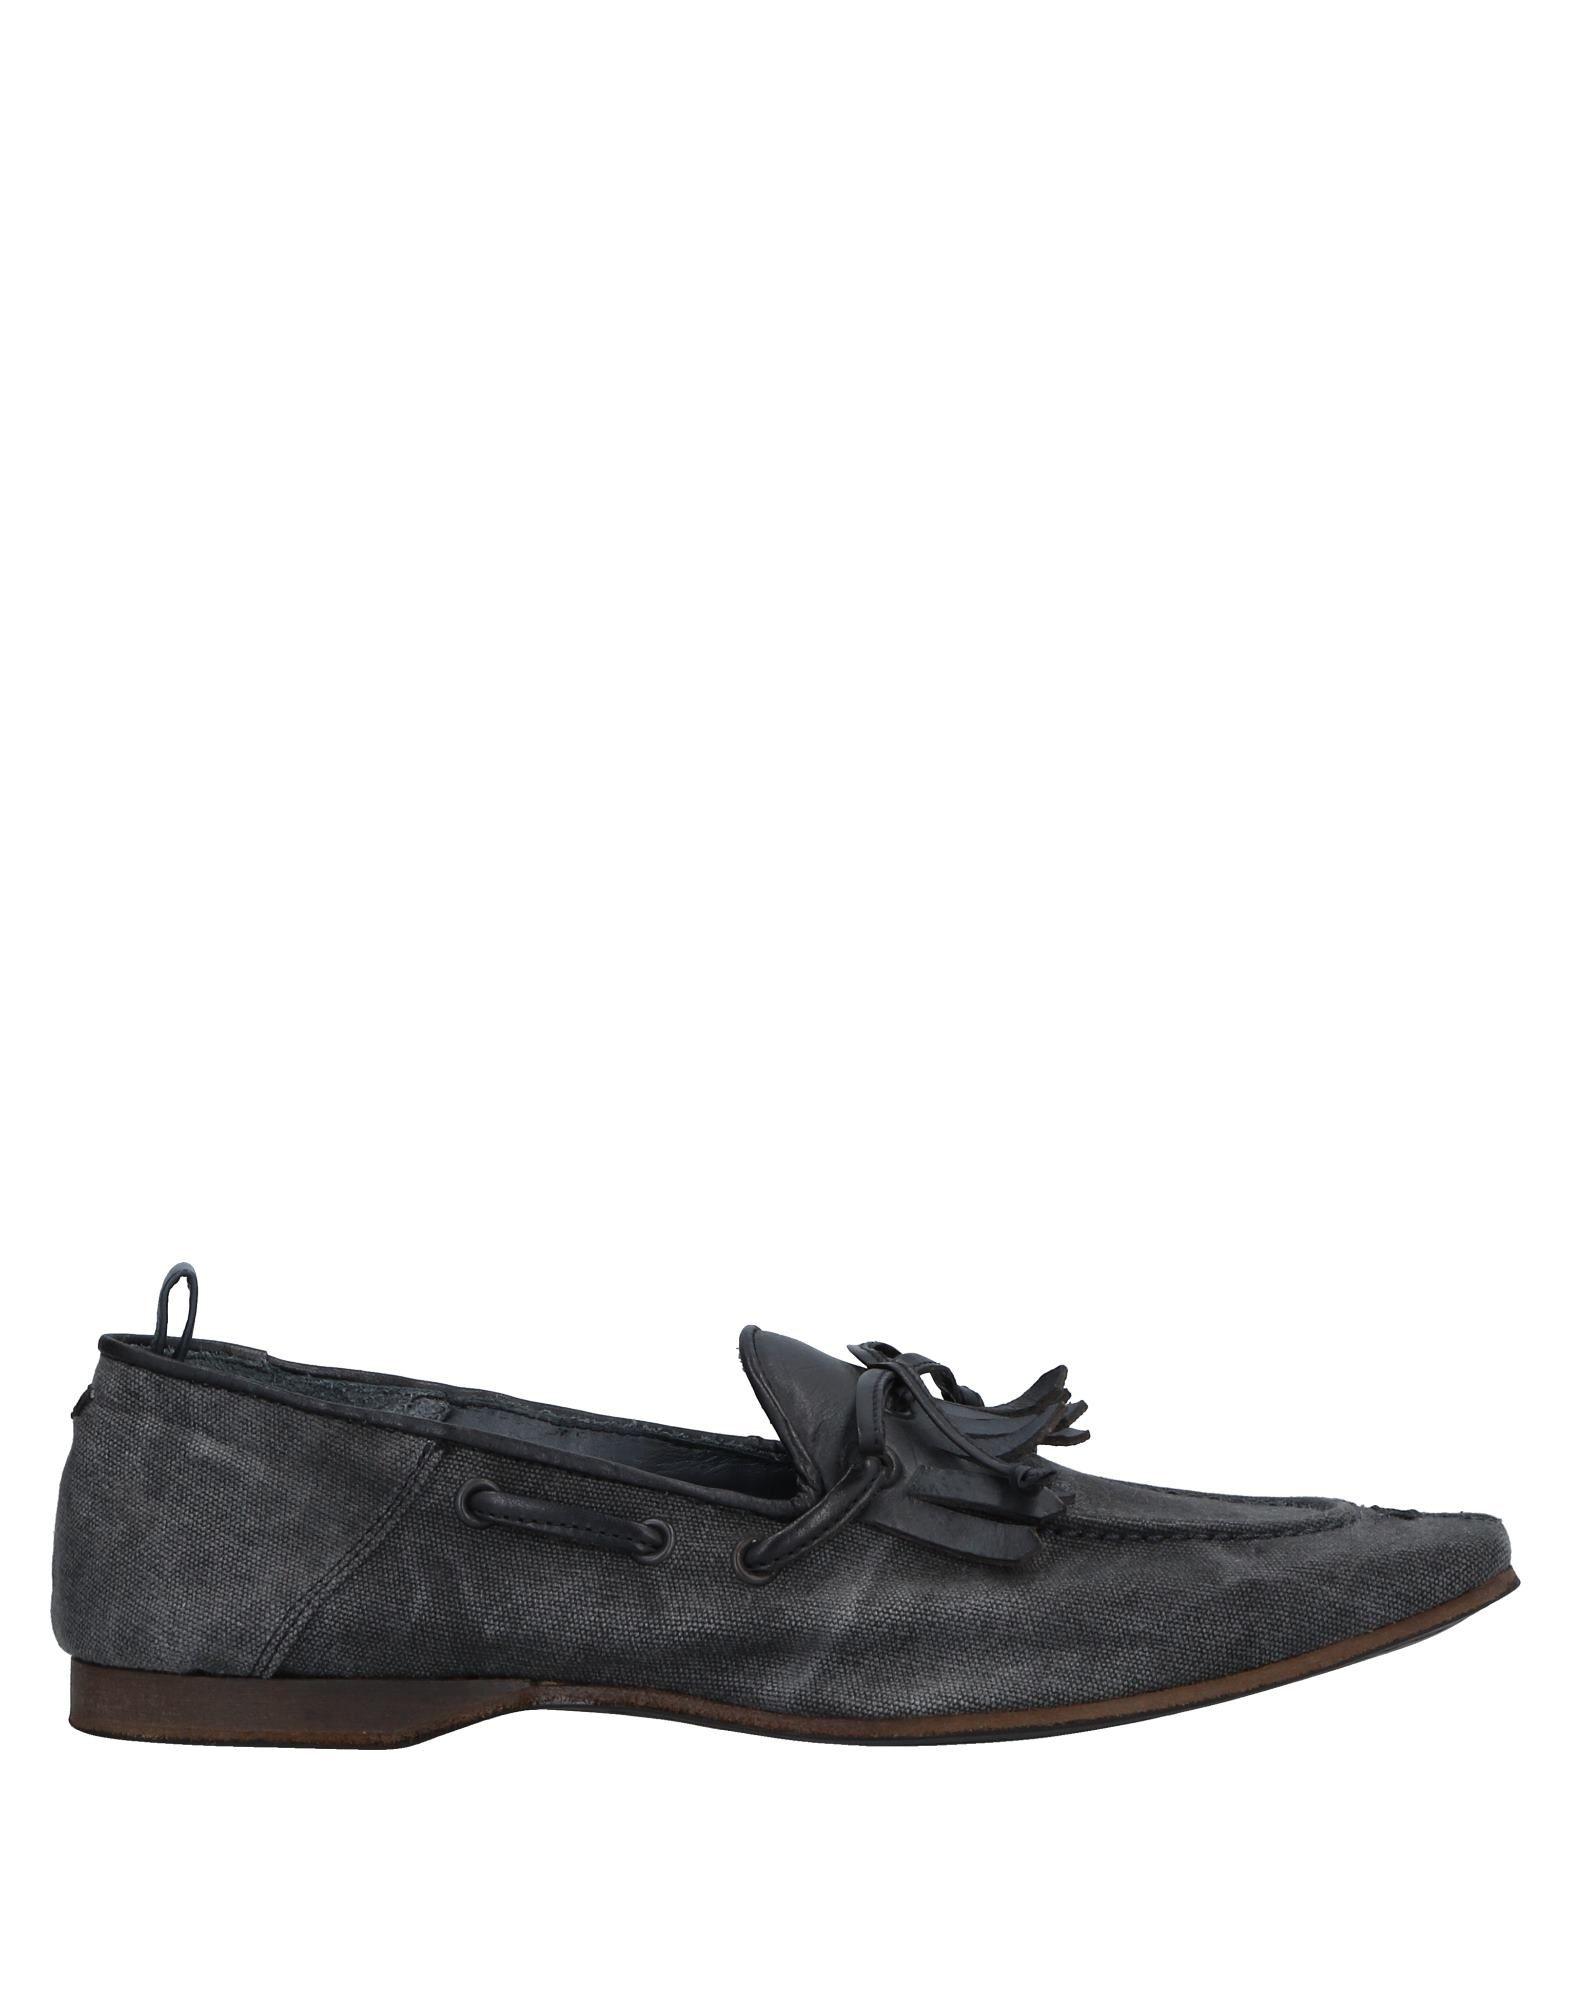 Daniele Alessandrini Mokassins Herren  11533348VS Gute Qualität beliebte Schuhe